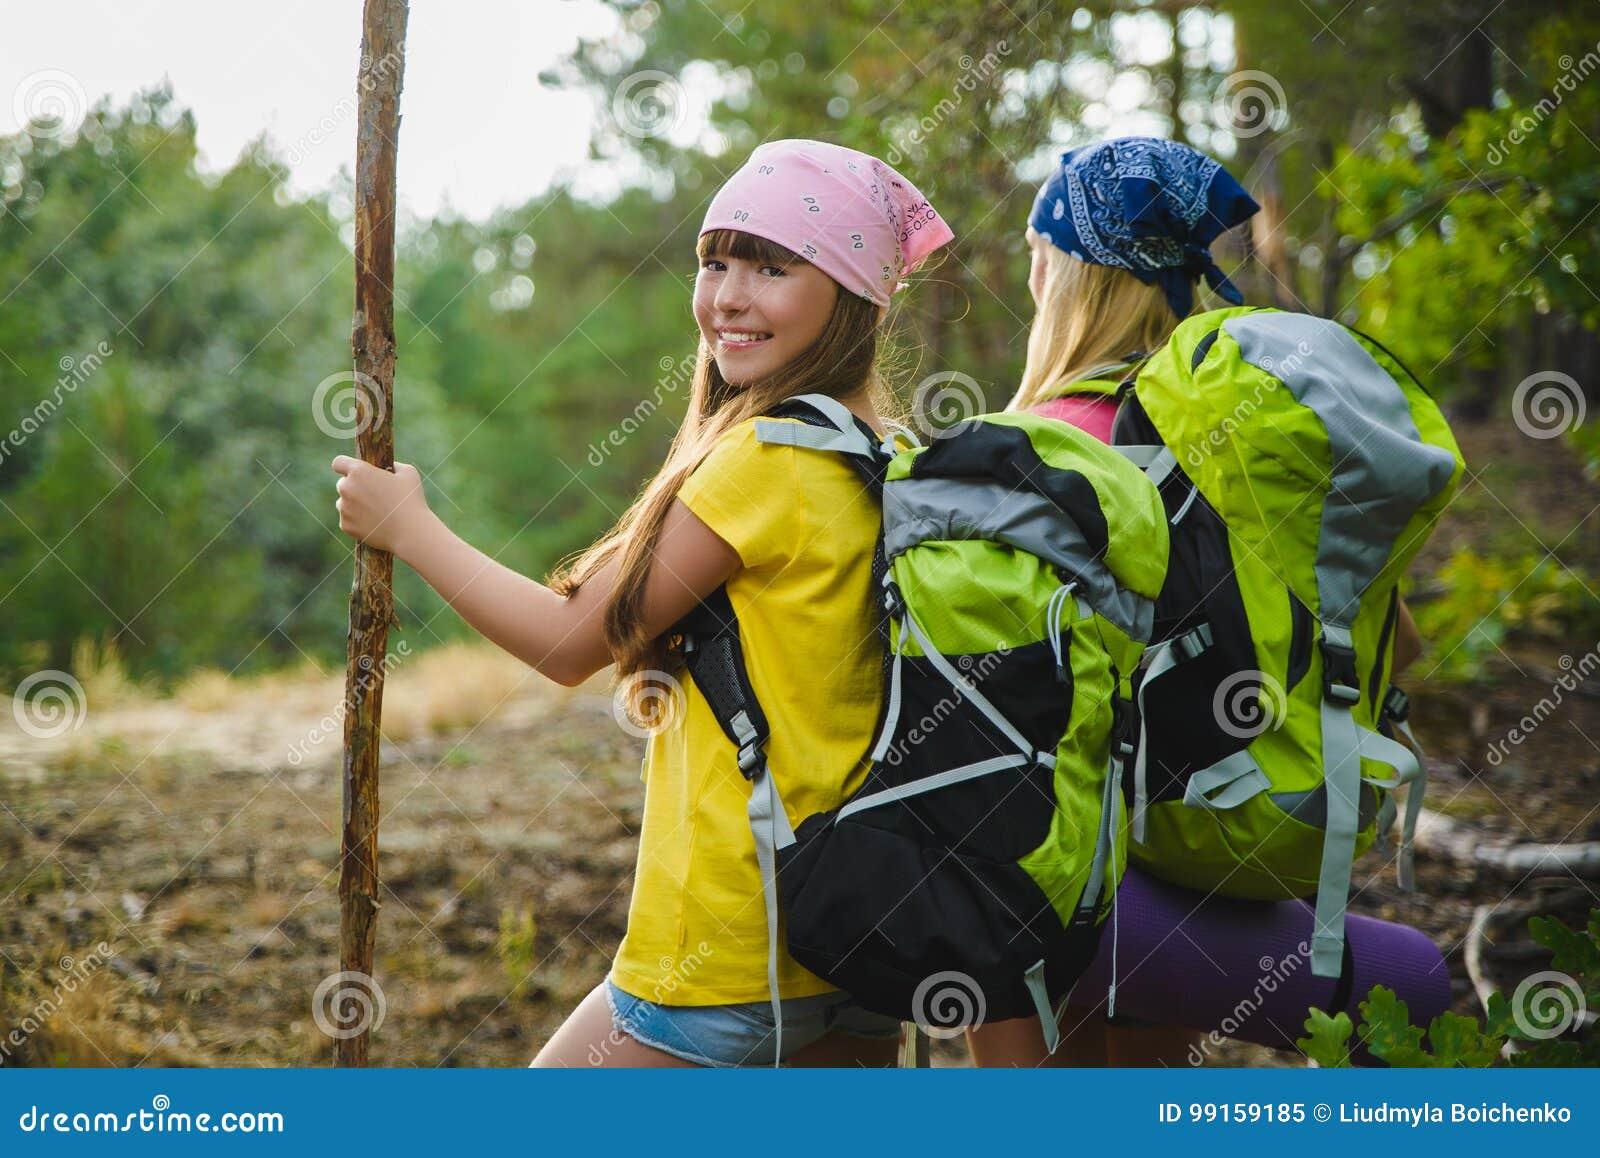 Meisjes met rugzak in heuvel bosavontuur, reis, toerismeconcept